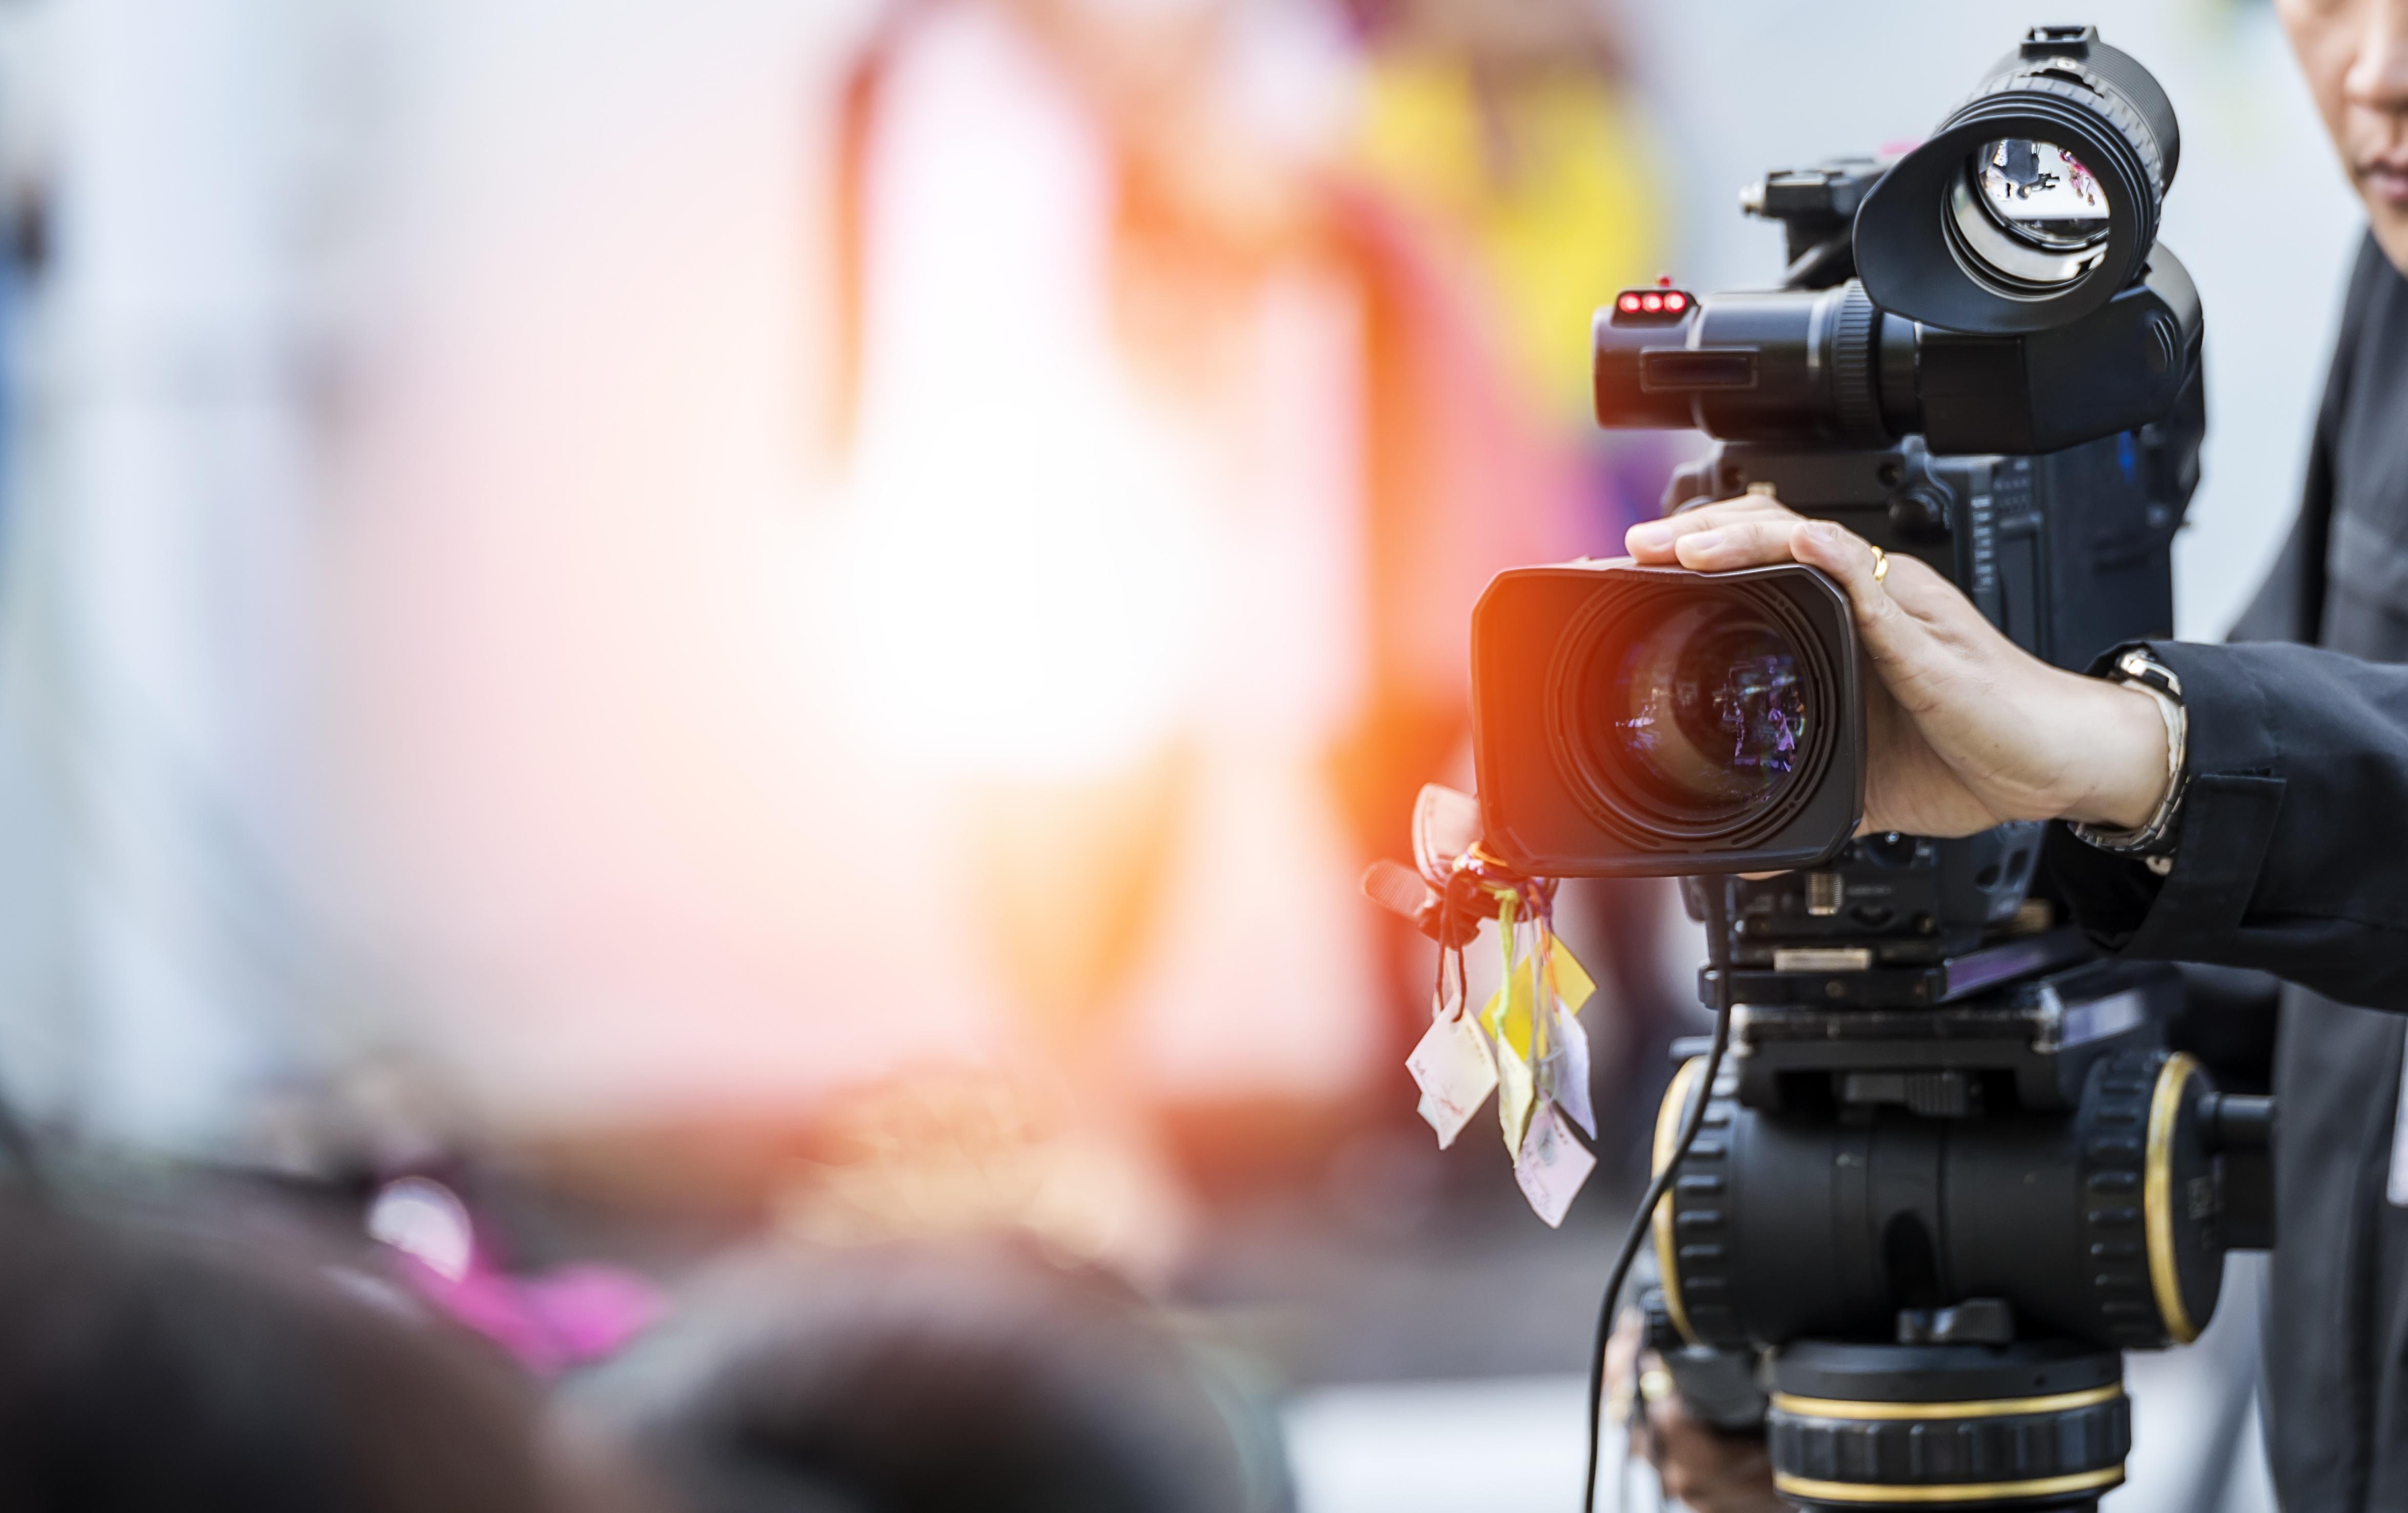 Production Management, Event Production, Event Producer, Producer